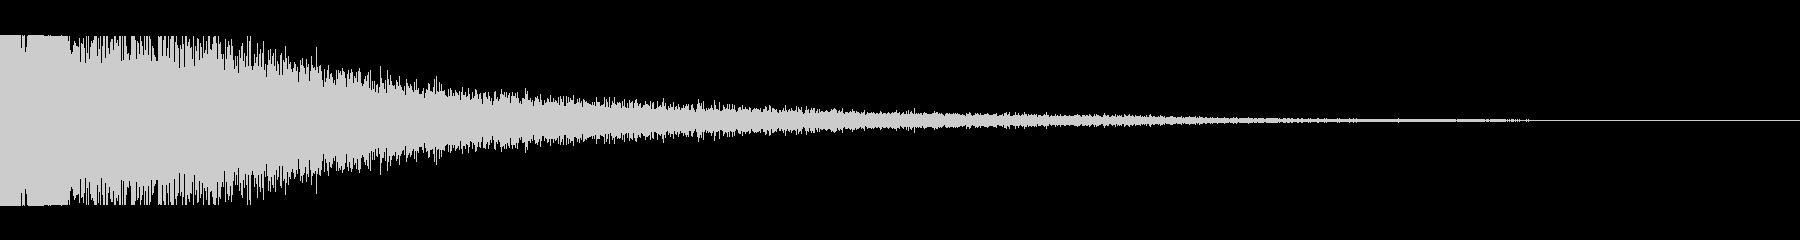 KANT驚愕ホラー衝撃ピアノ音3の未再生の波形